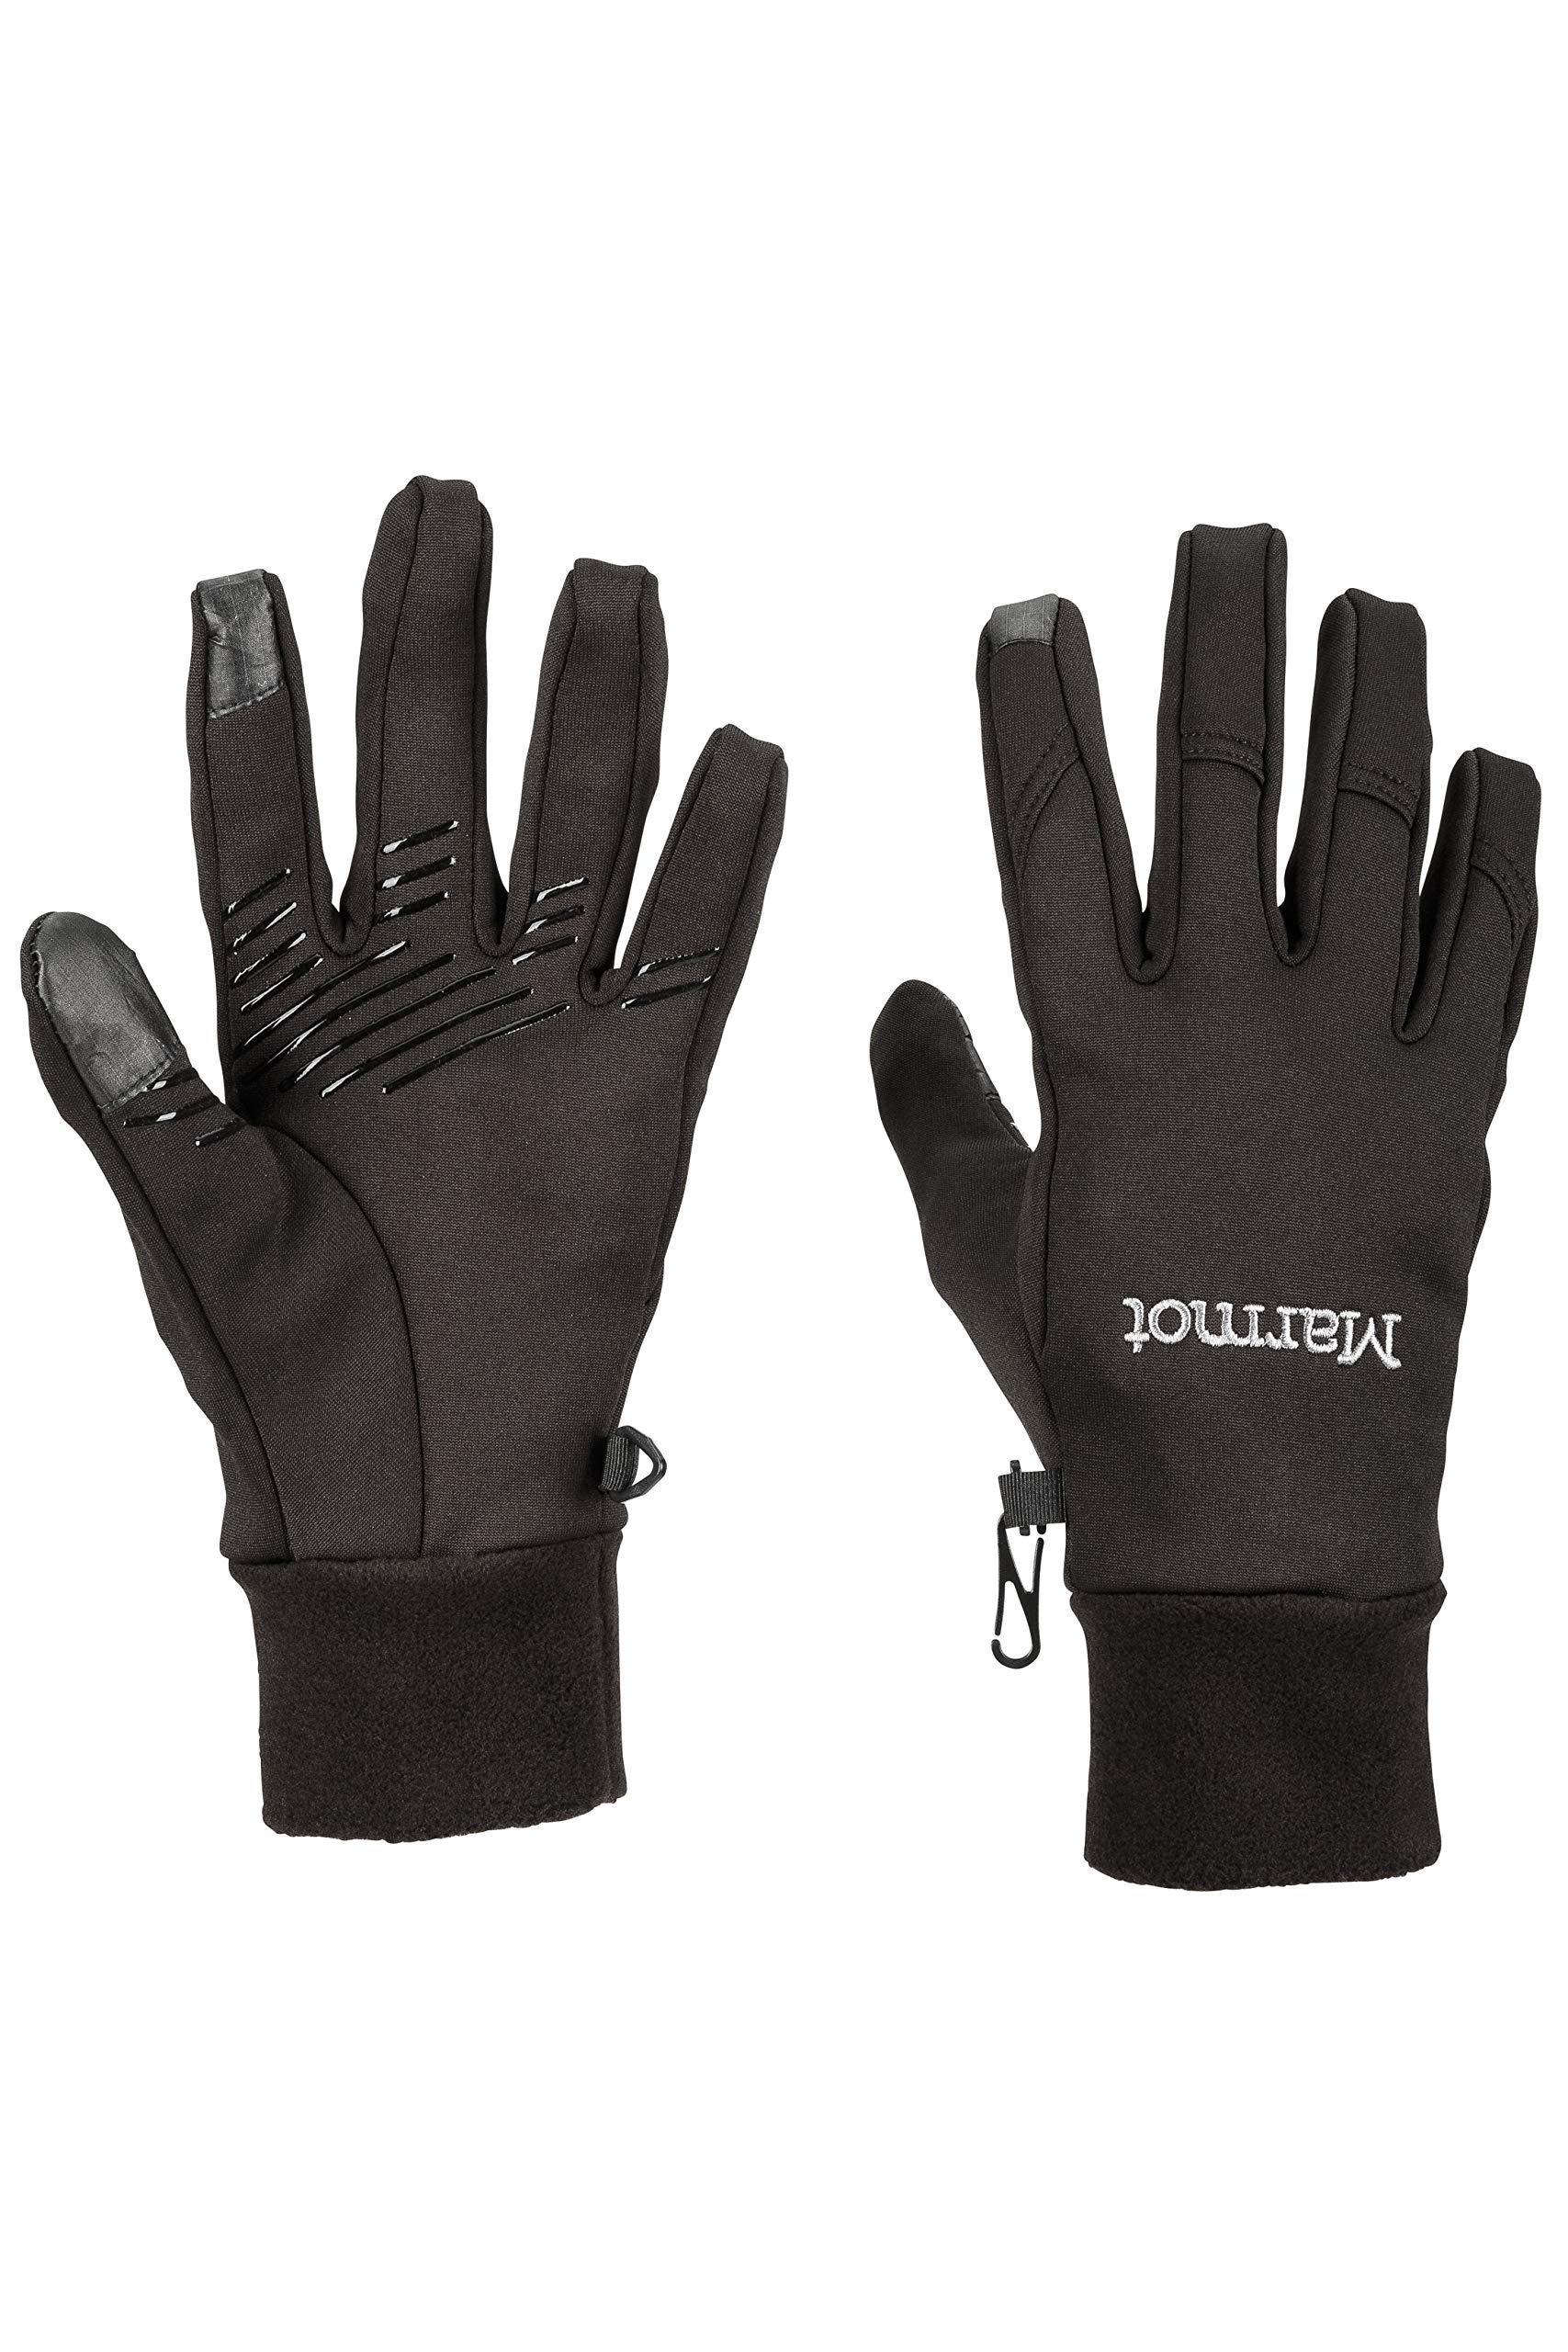 Marmot Women's Connect Glove, Black, Medium